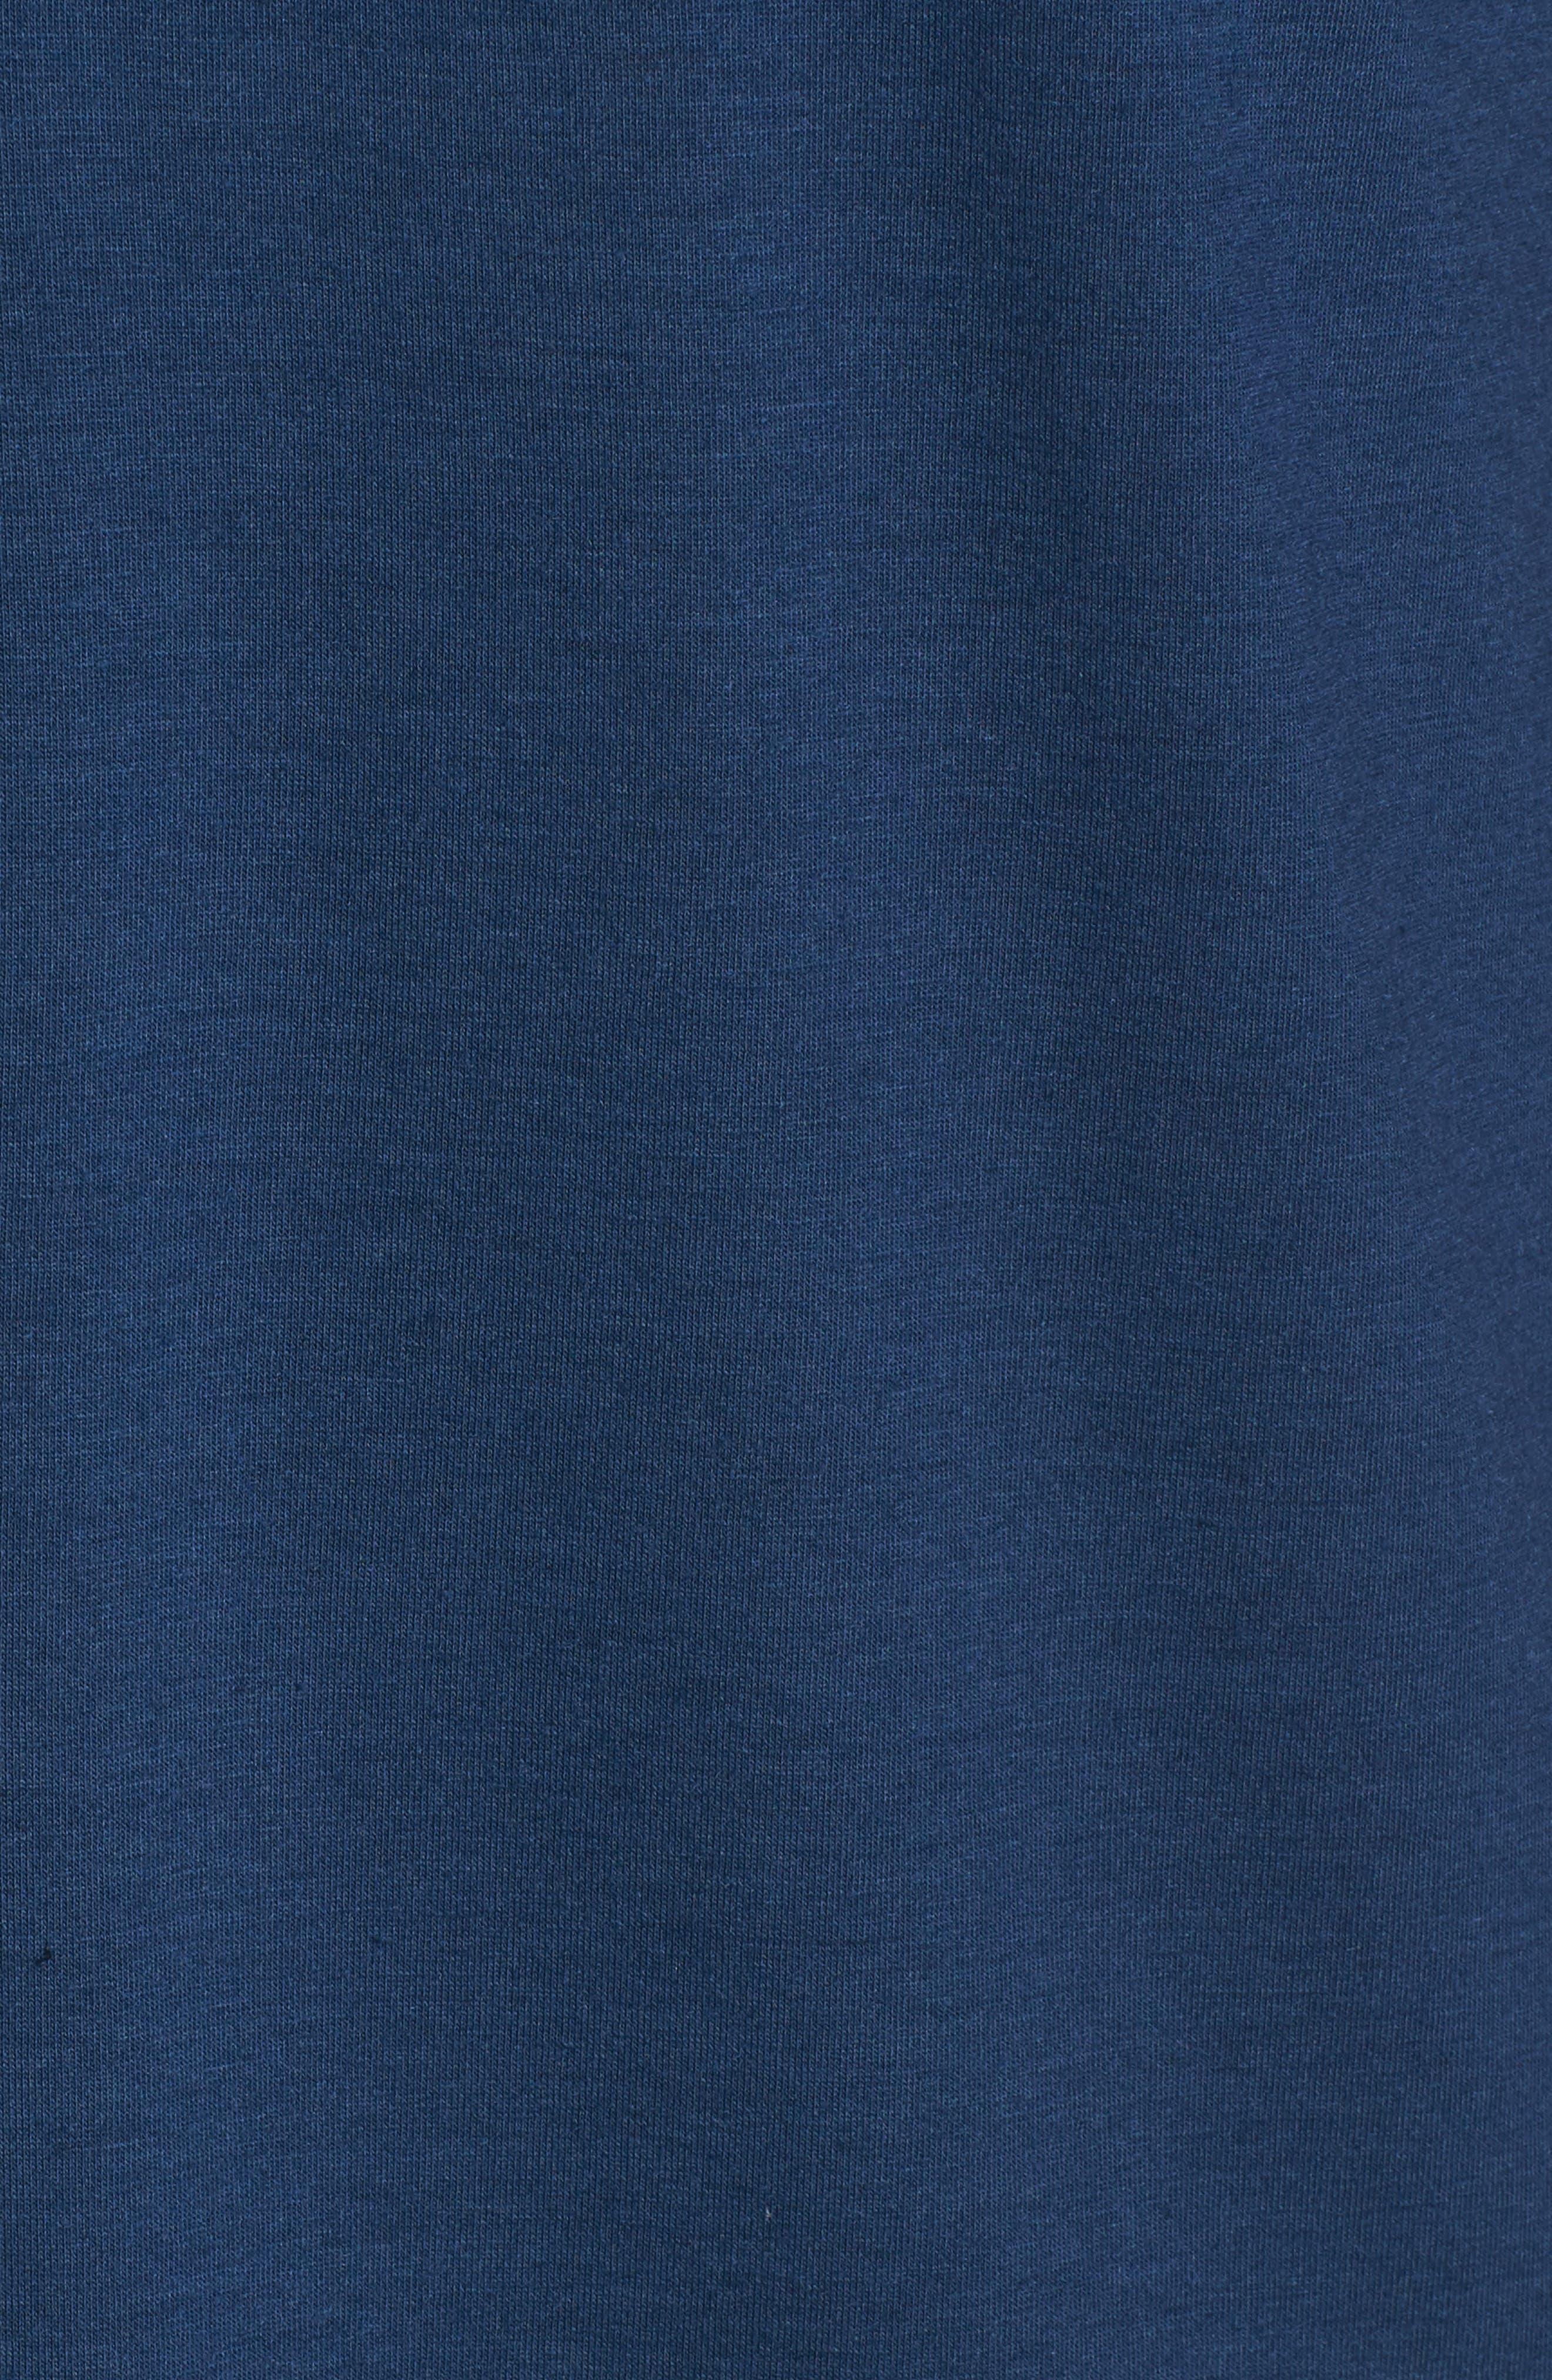 Tigua Short Sleeve Henley,                             Alternate thumbnail 5, color,                             Blue